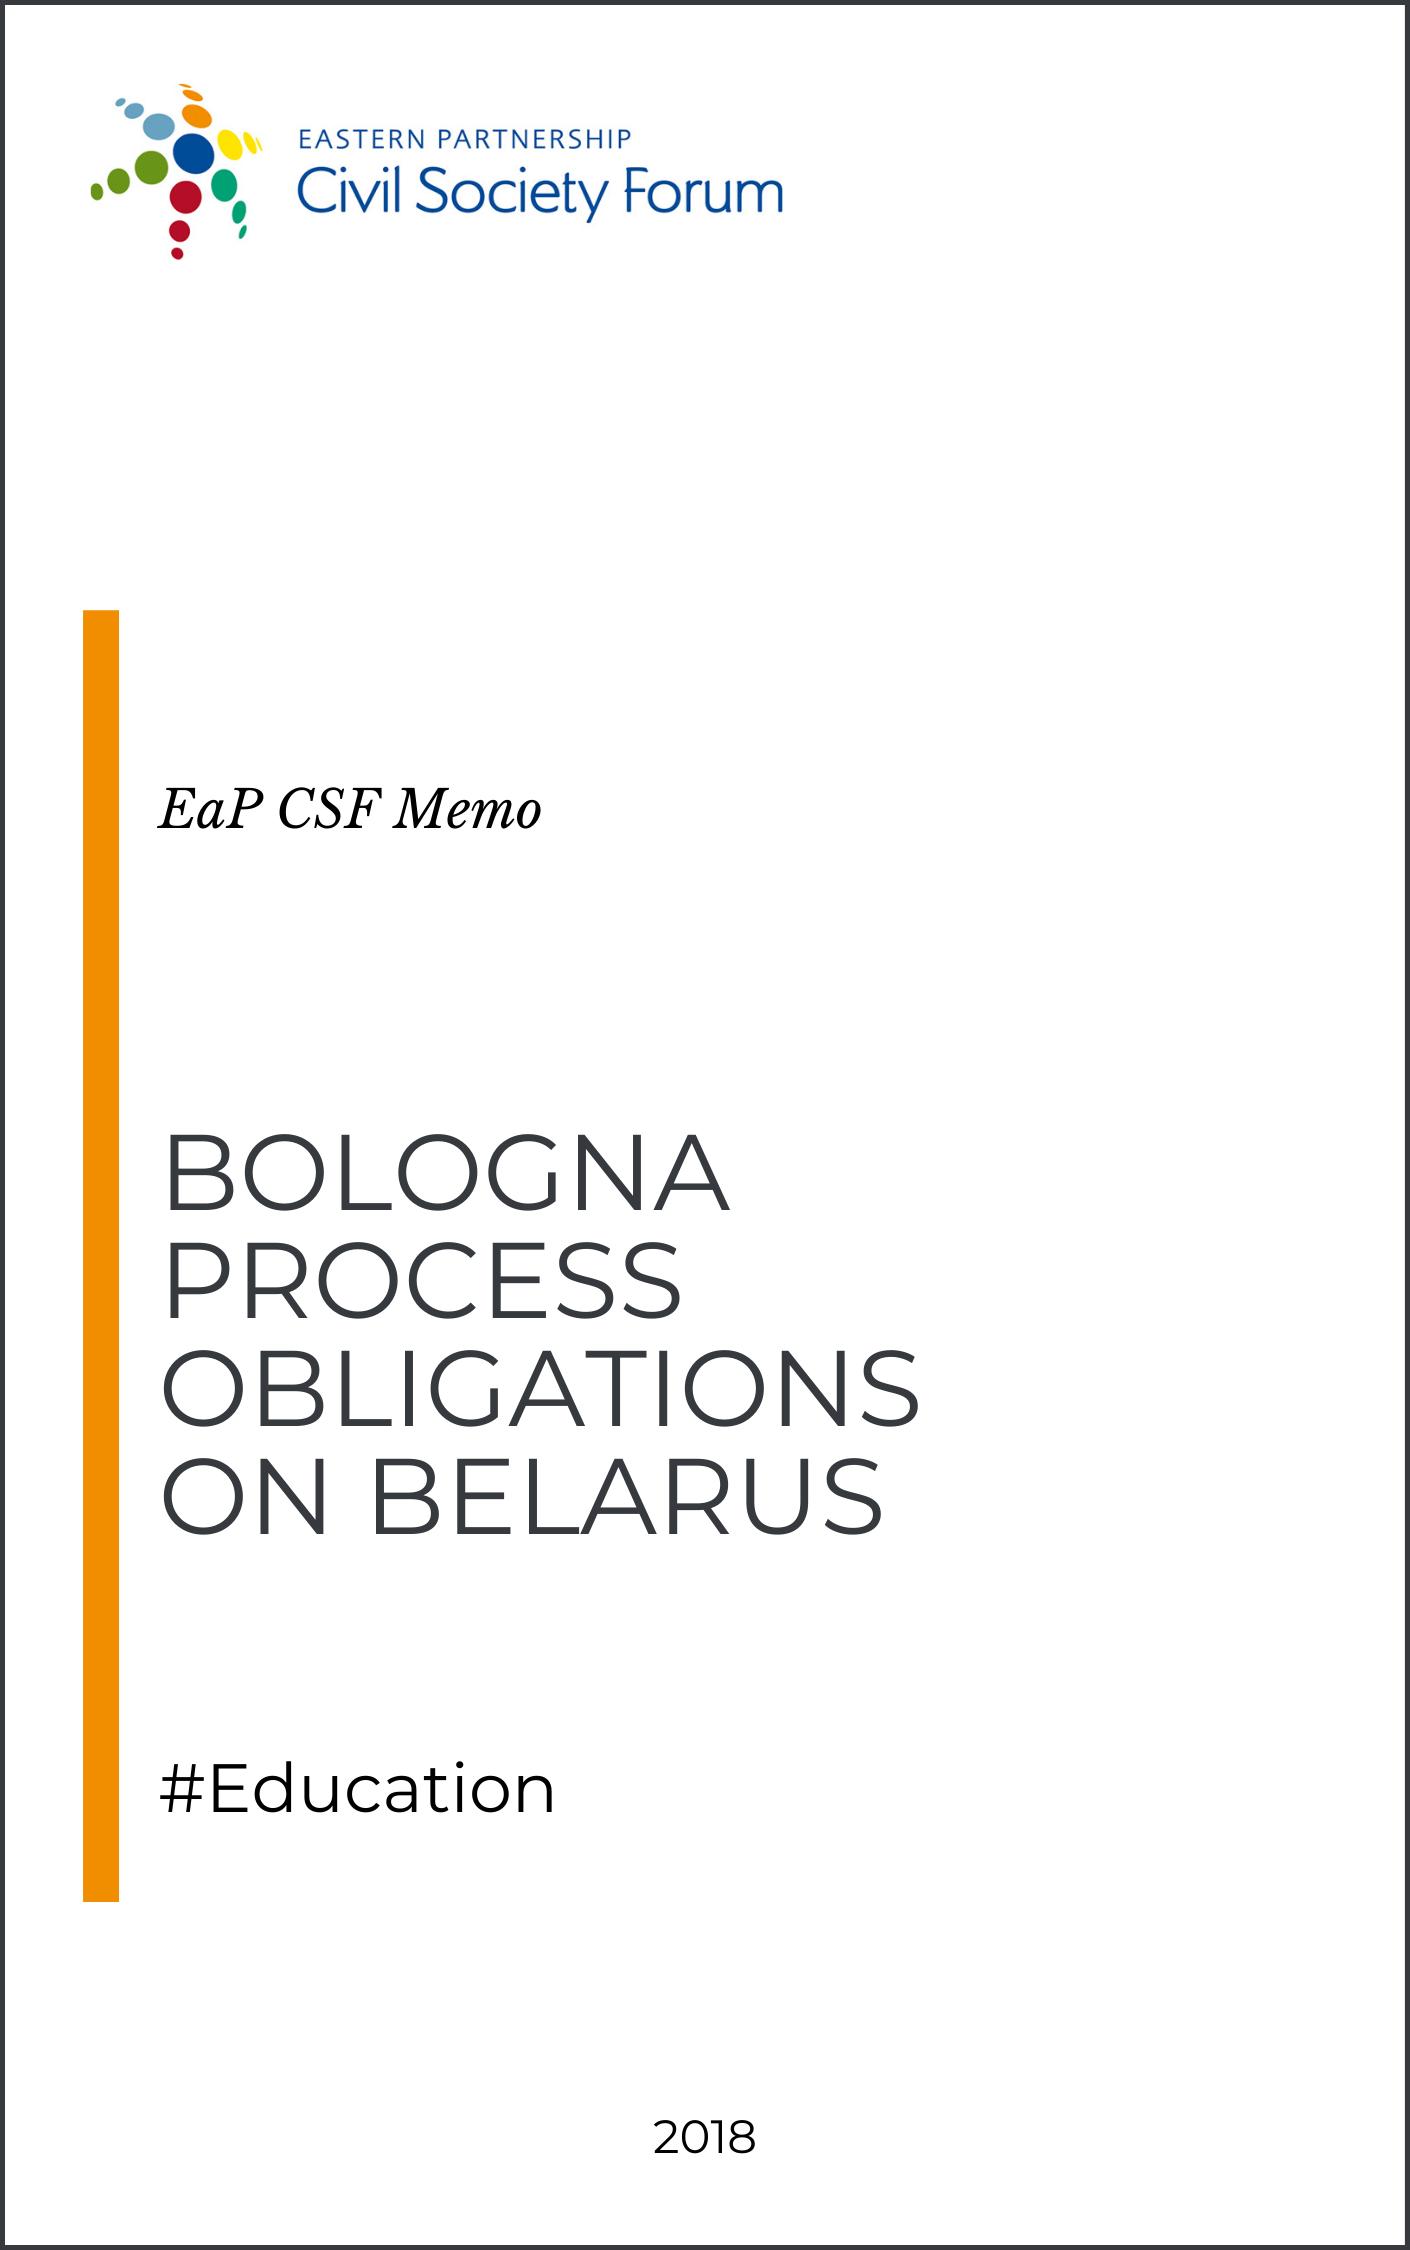 Bologna Process Obligations on Belarus